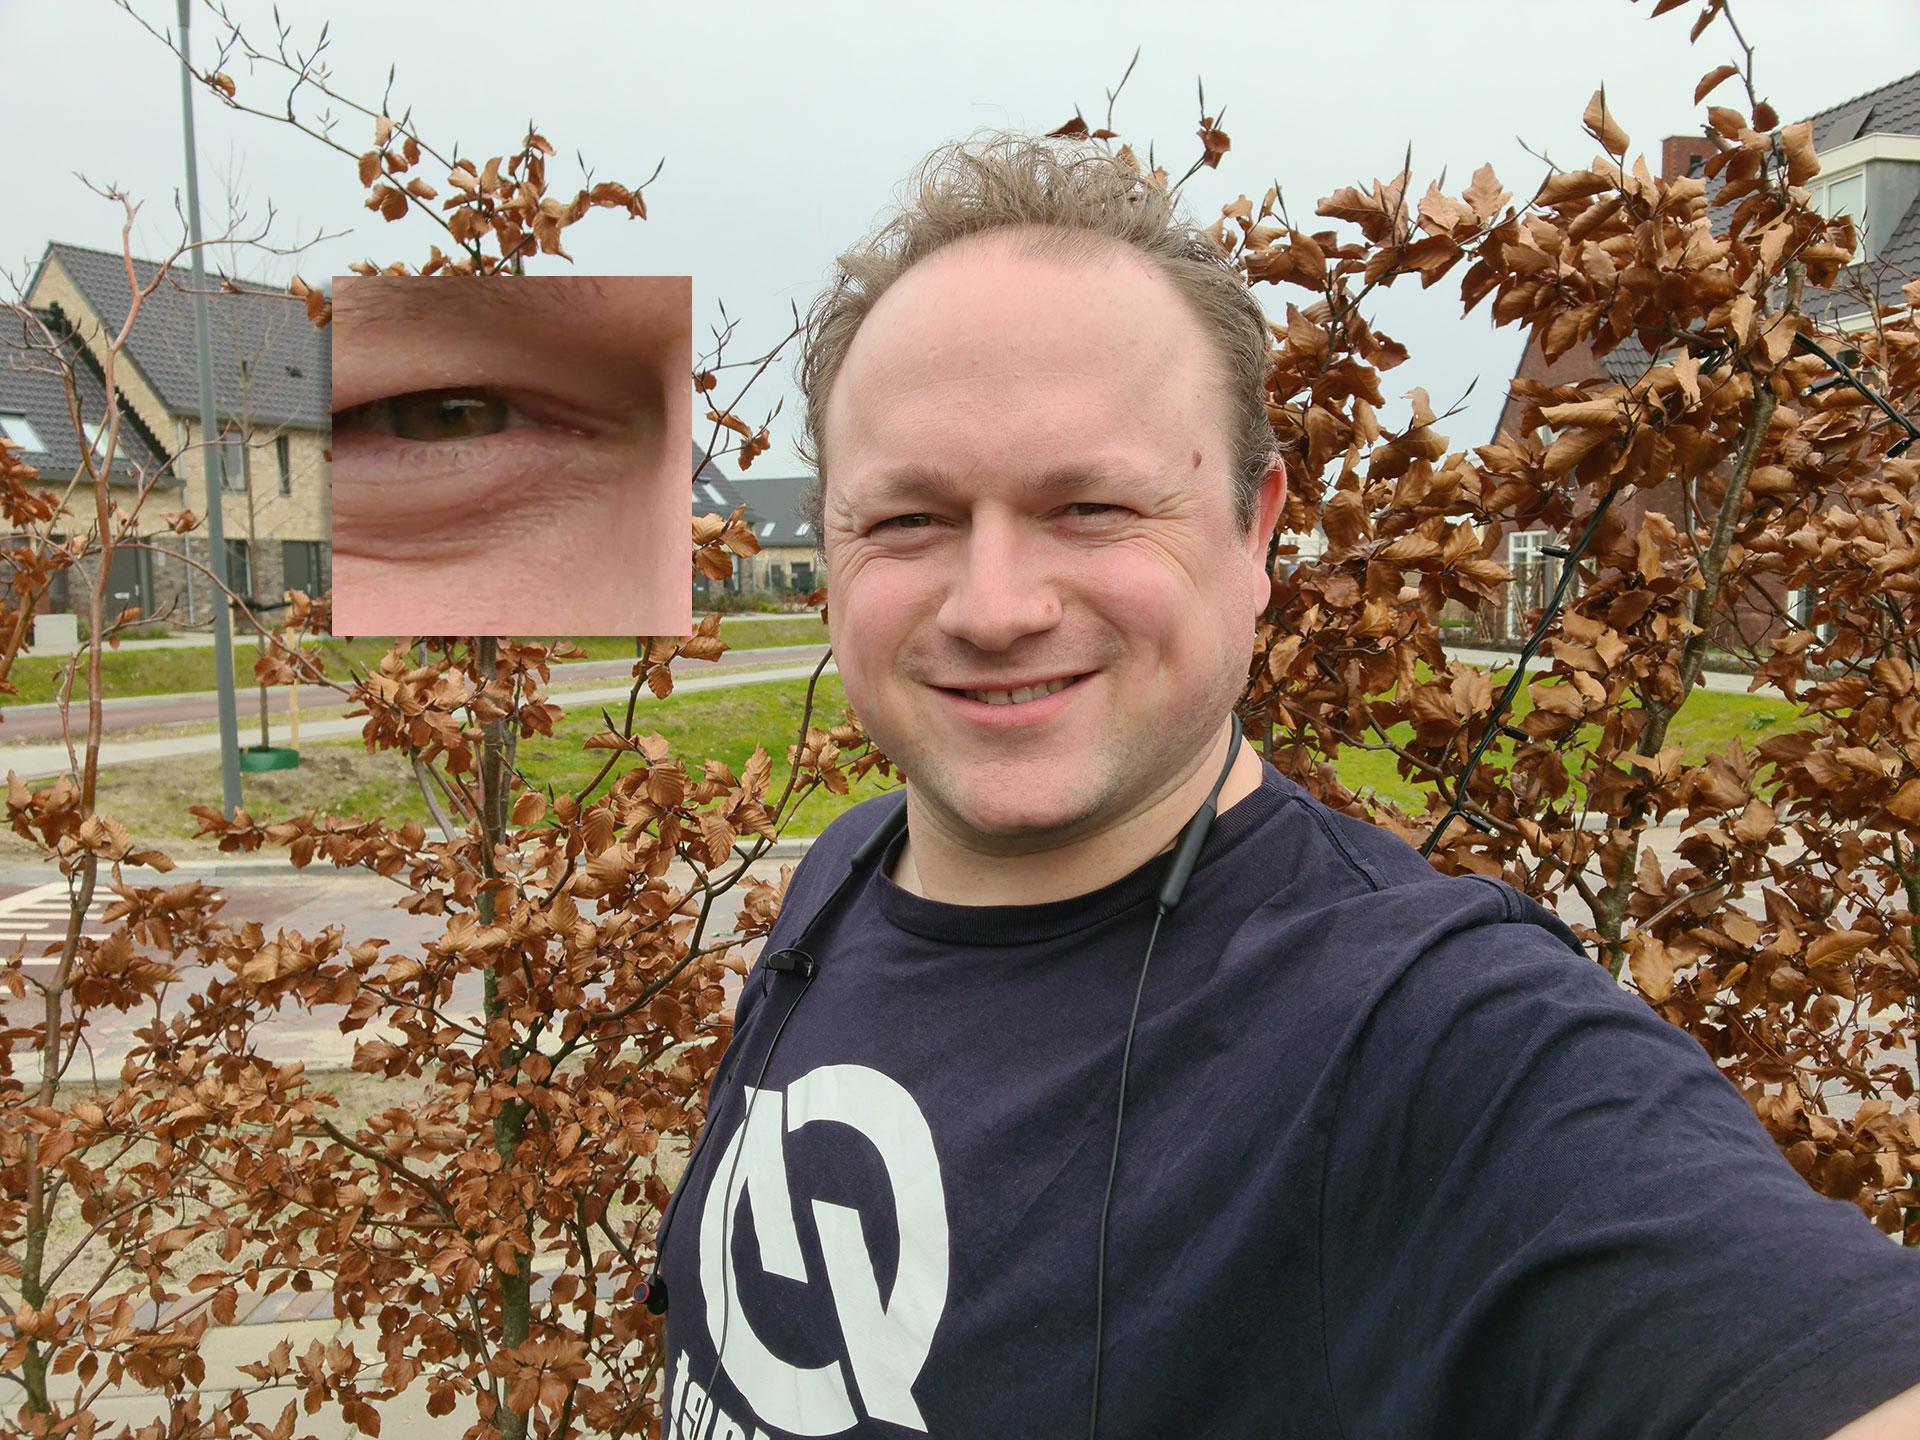 40 megapixel selfie Samsung Galaxy S20 Ultra